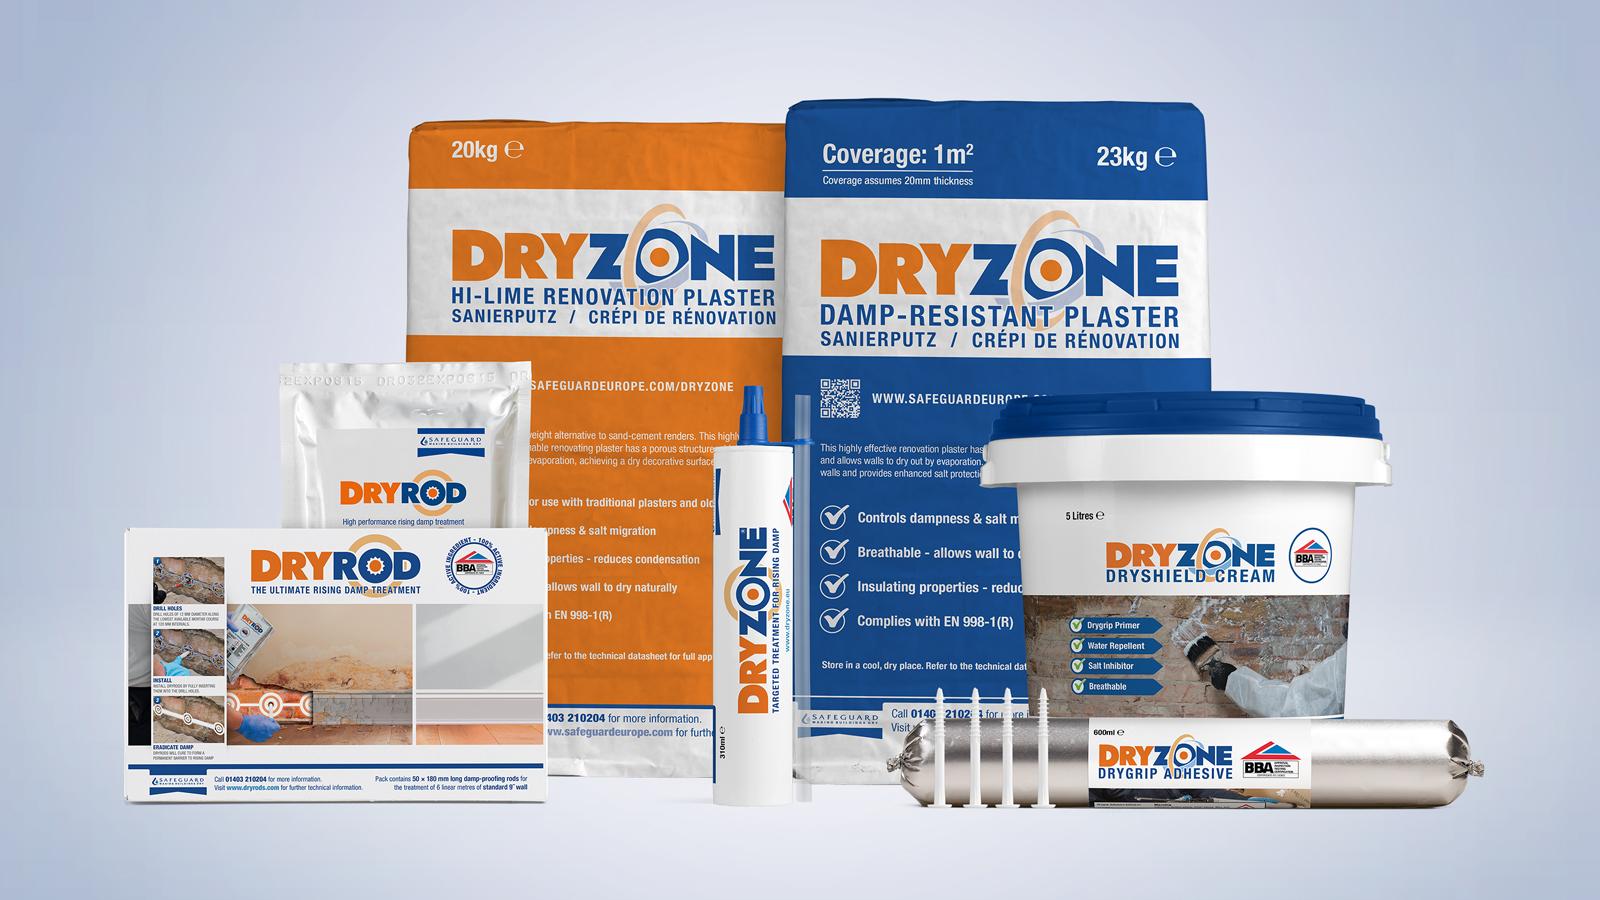 The Dryzone System Range